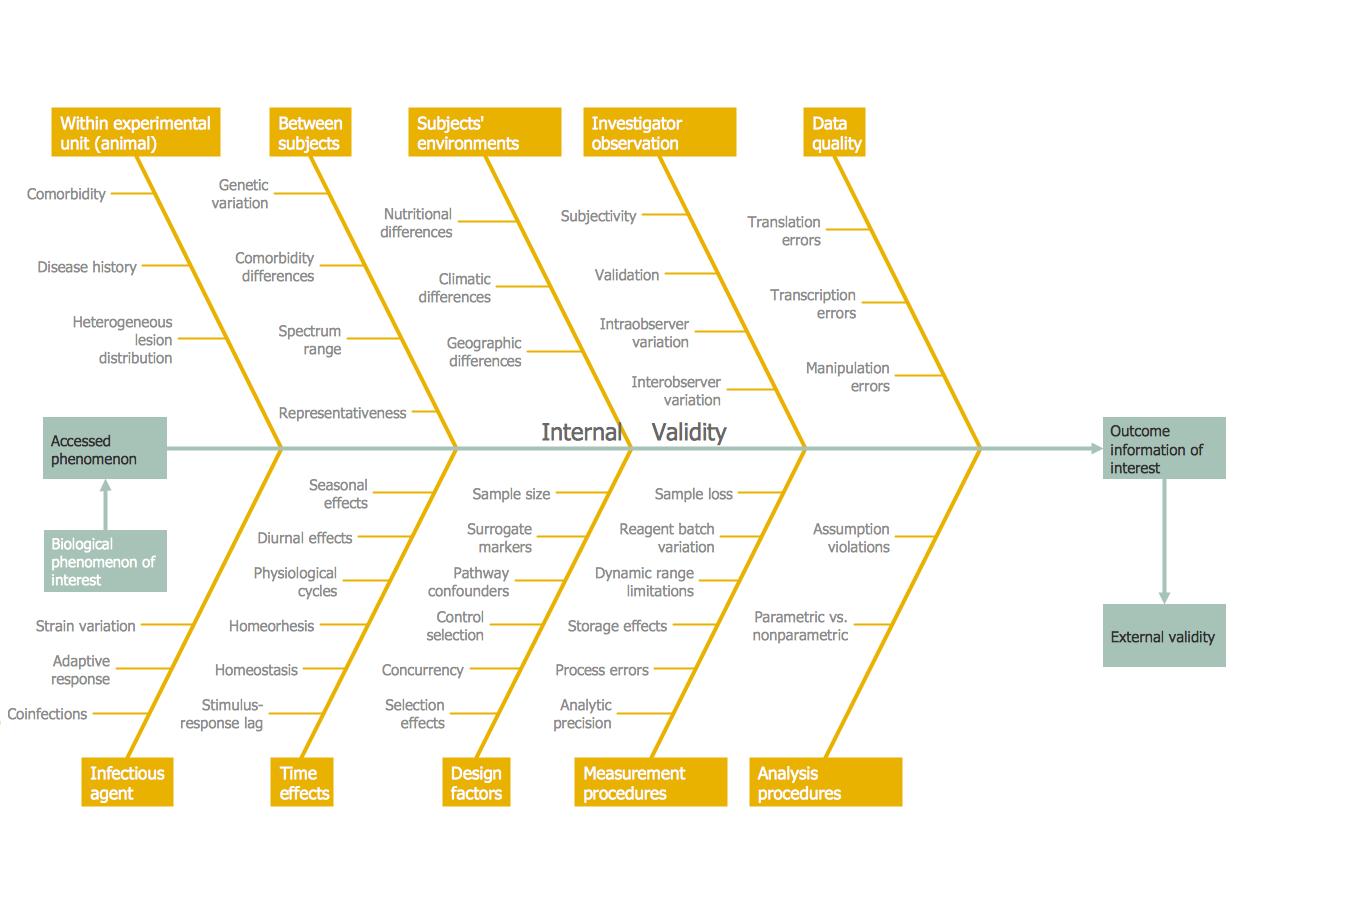 management fishbone diagram increase in productivity [ 1350 x 900 Pixel ]